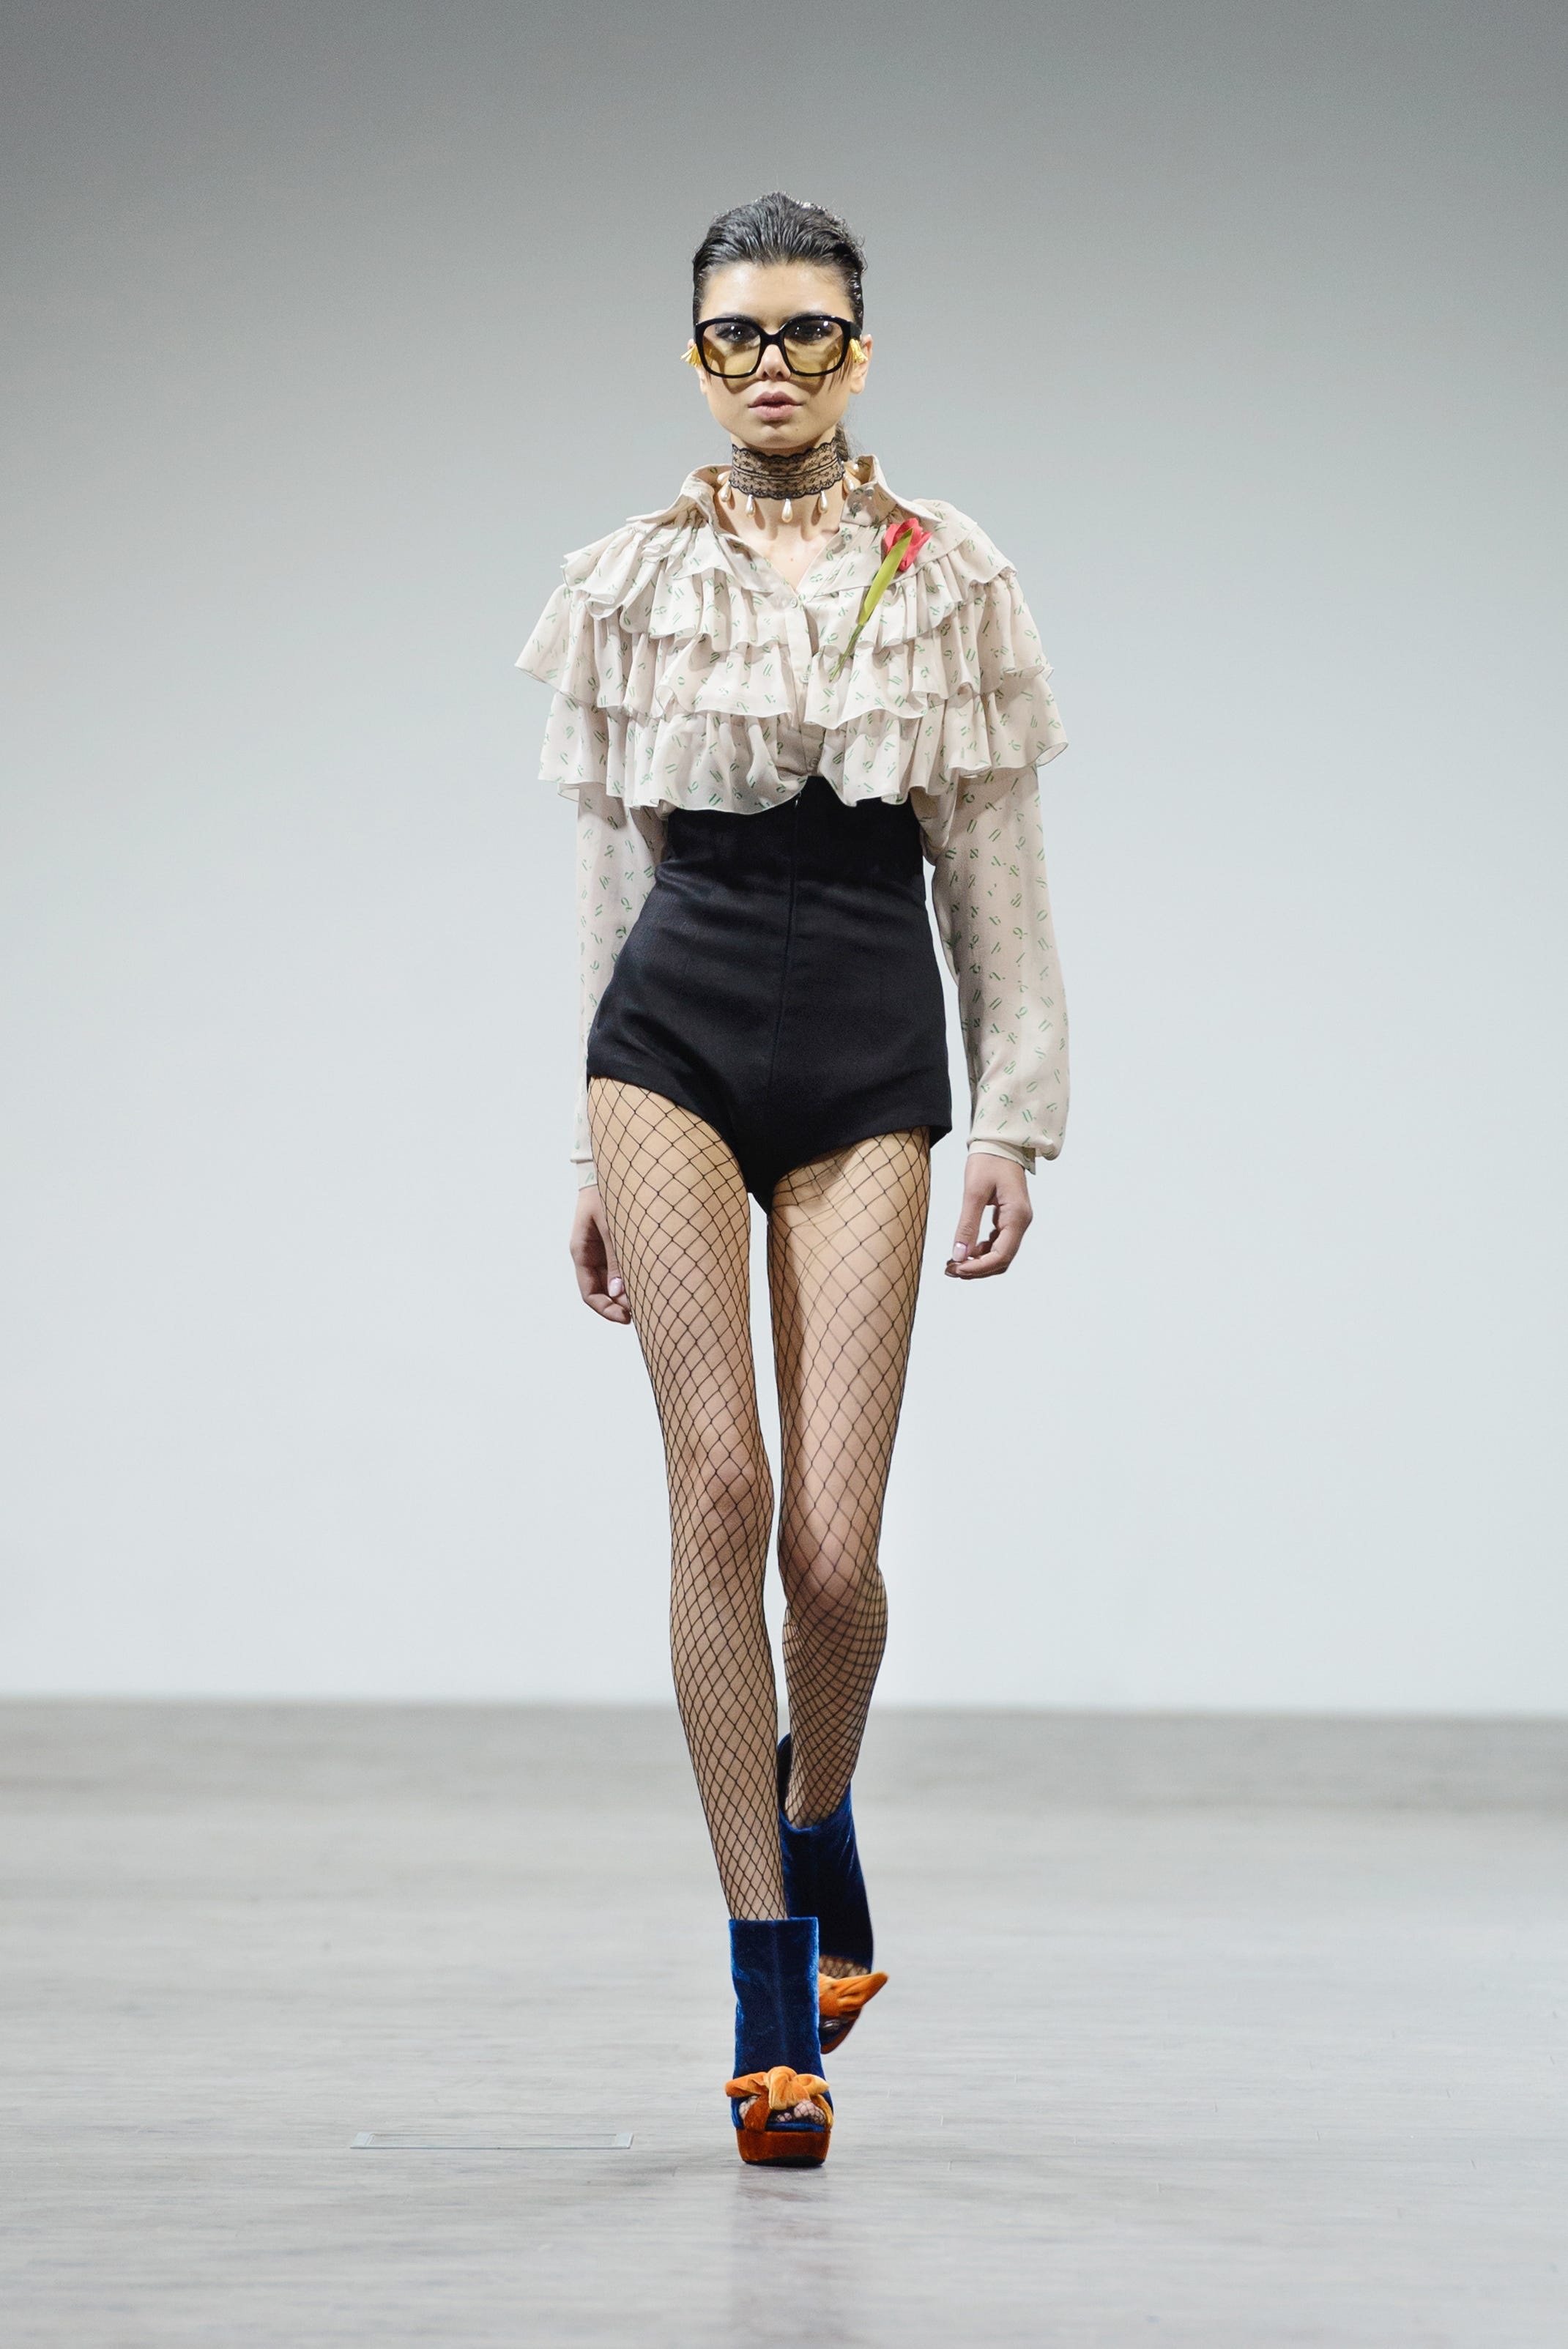 Mercedes Benz Of North Haven >> Mercedes Benz Fashion Week Tbilisi Designers